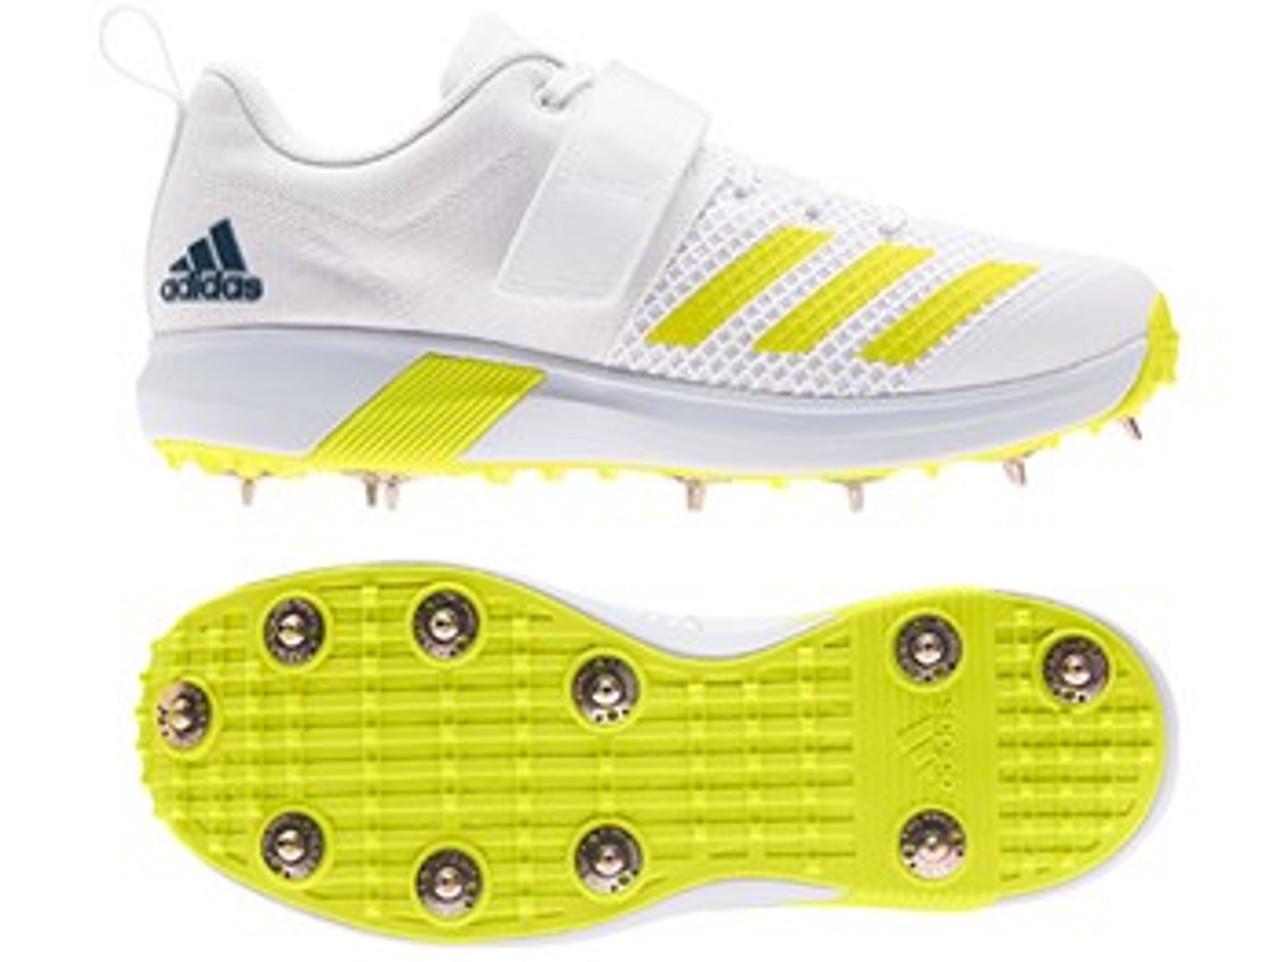 Adidas Adipower Vector 20 Cricket Shoes 2021